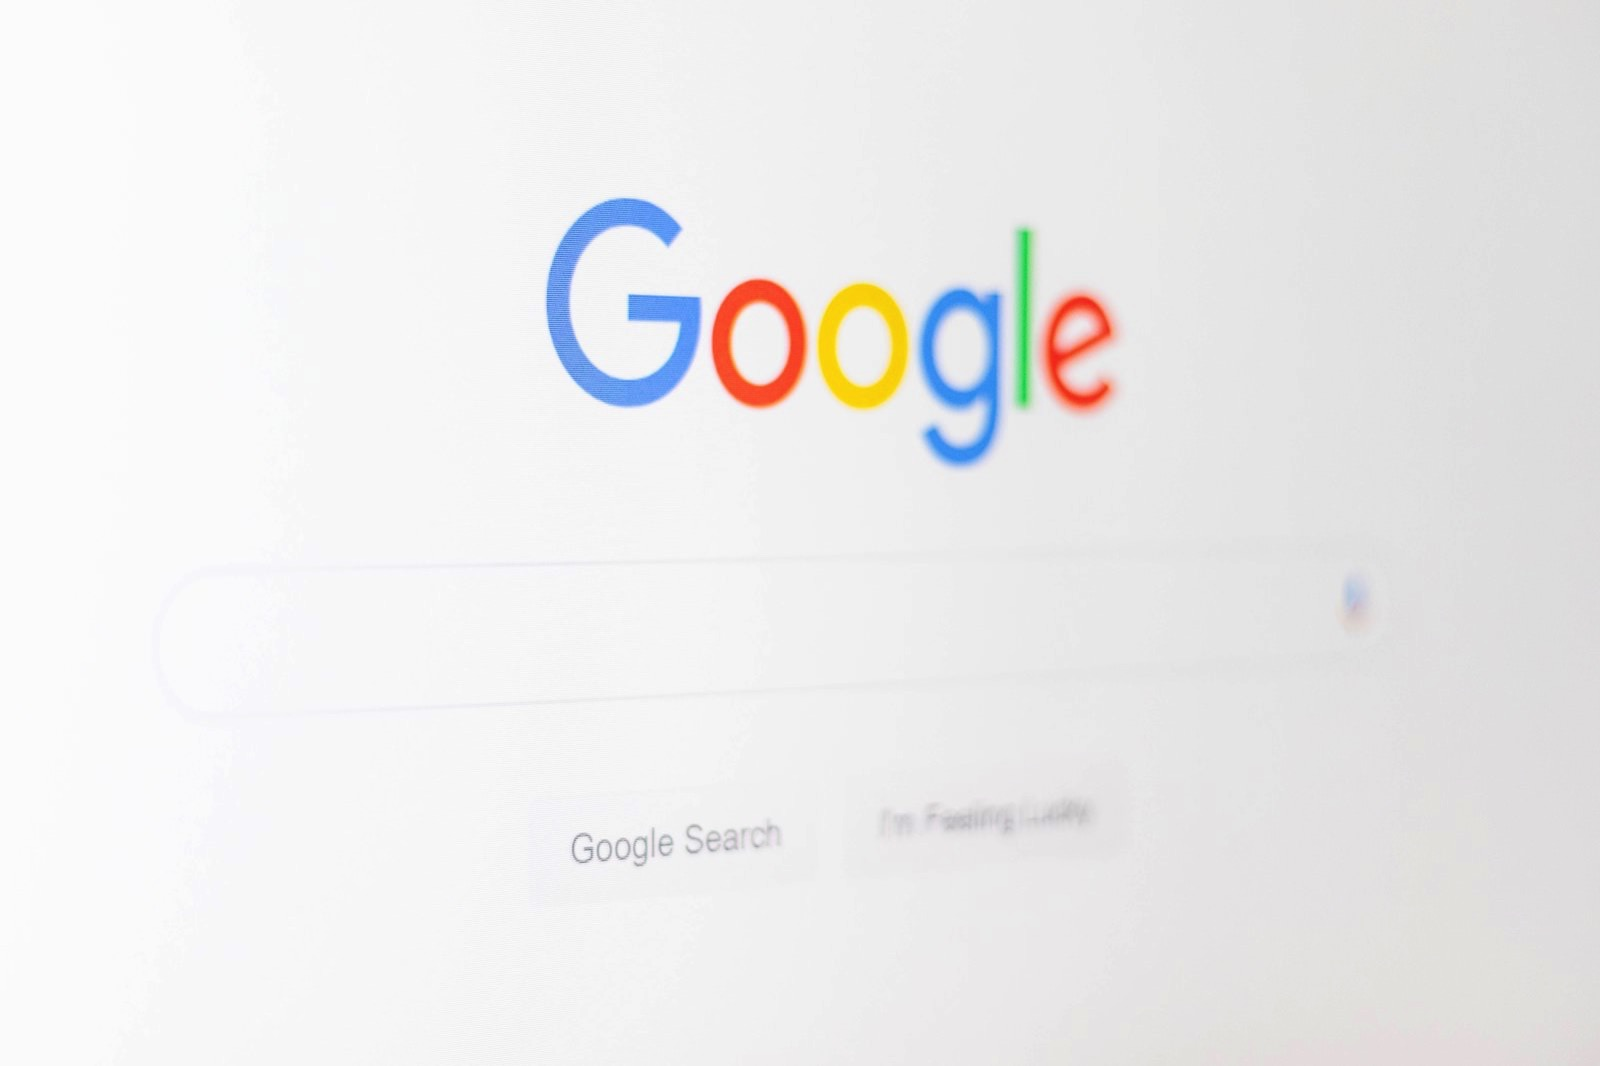 Christian wiediger 1473971 unsplash google